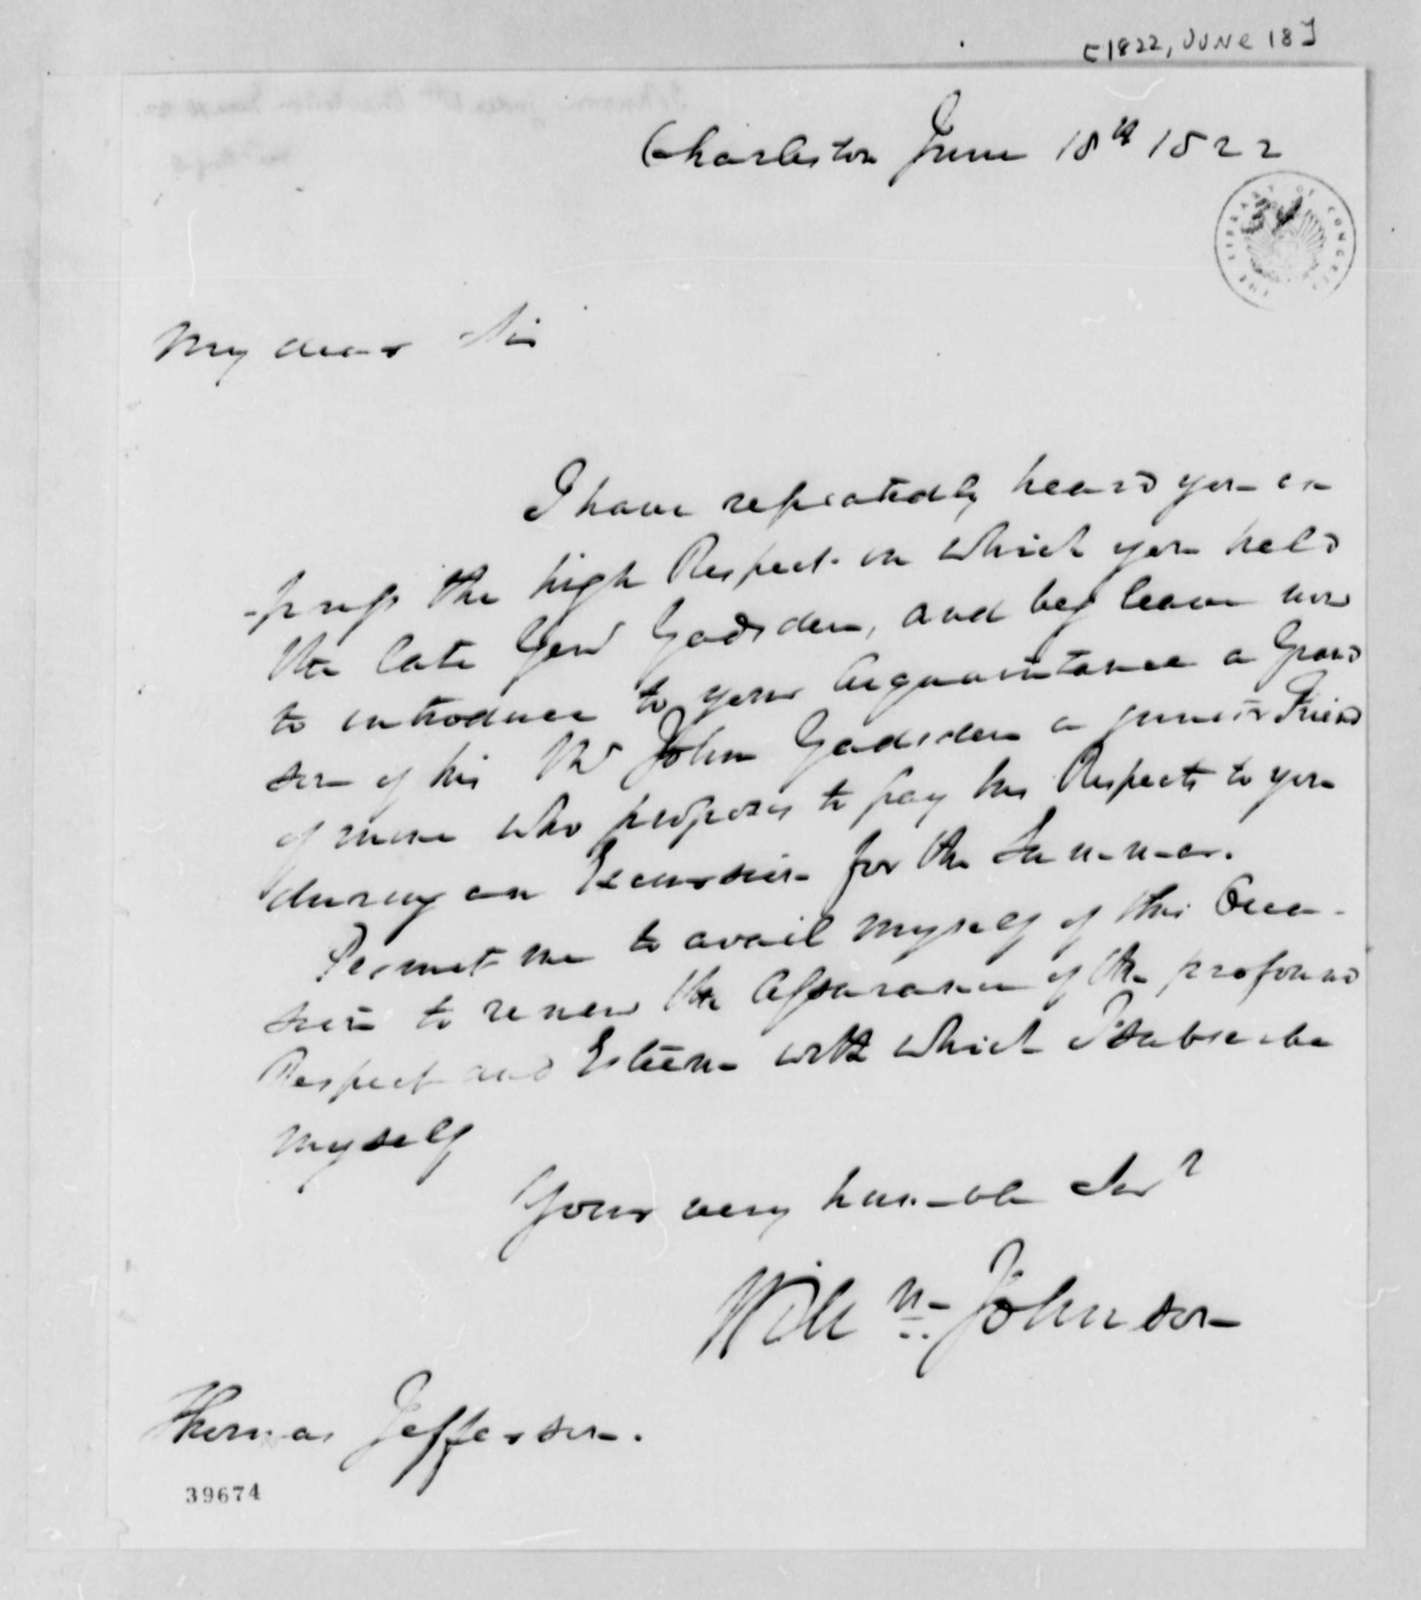 William Johnson to Thomas Jefferson, June 18, 1822